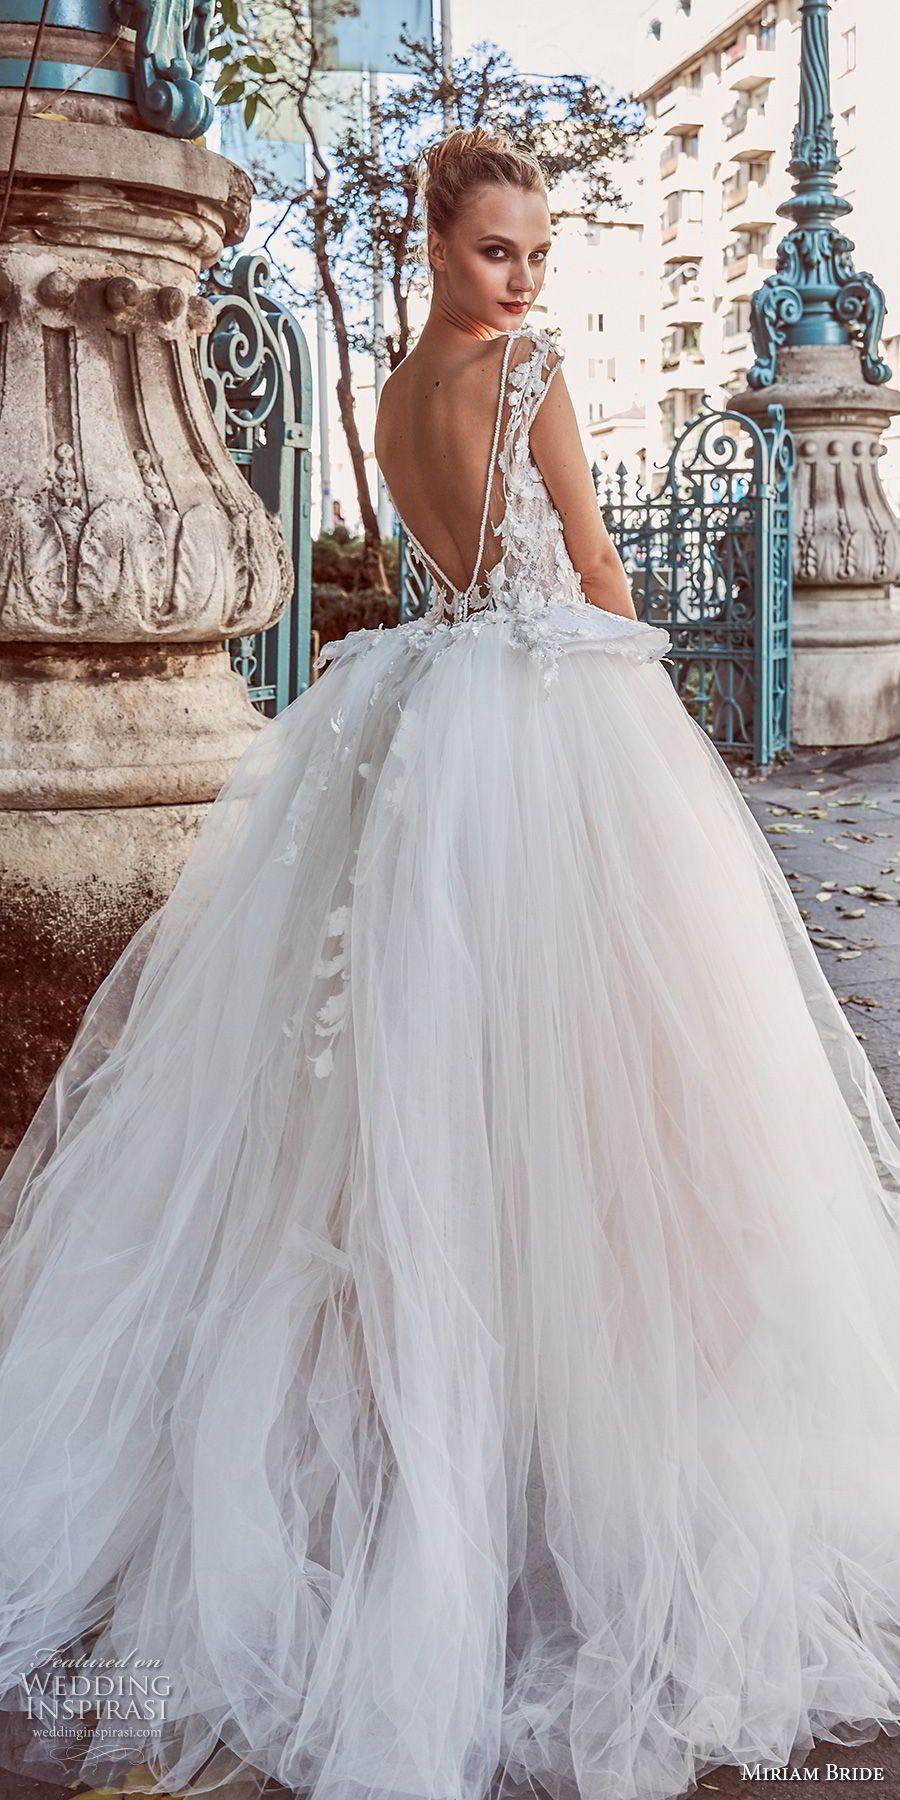 Miriams bride wedding dresses noivas pinterest chapel